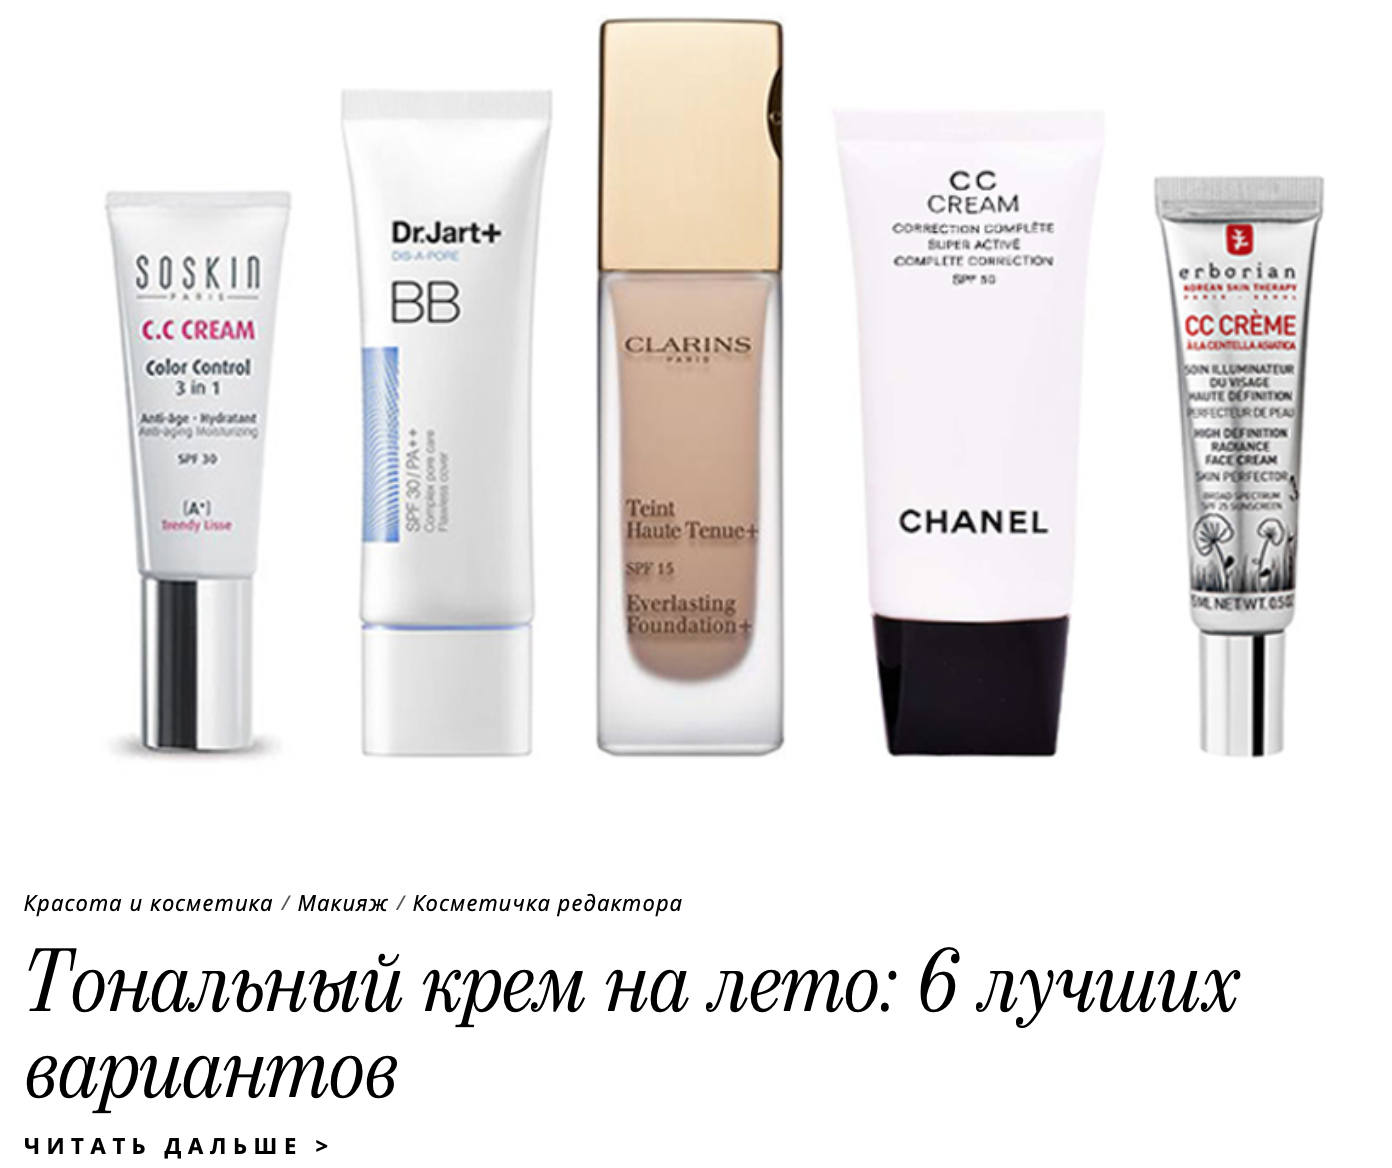 Soskin cc cream выбор редактора beauty hack